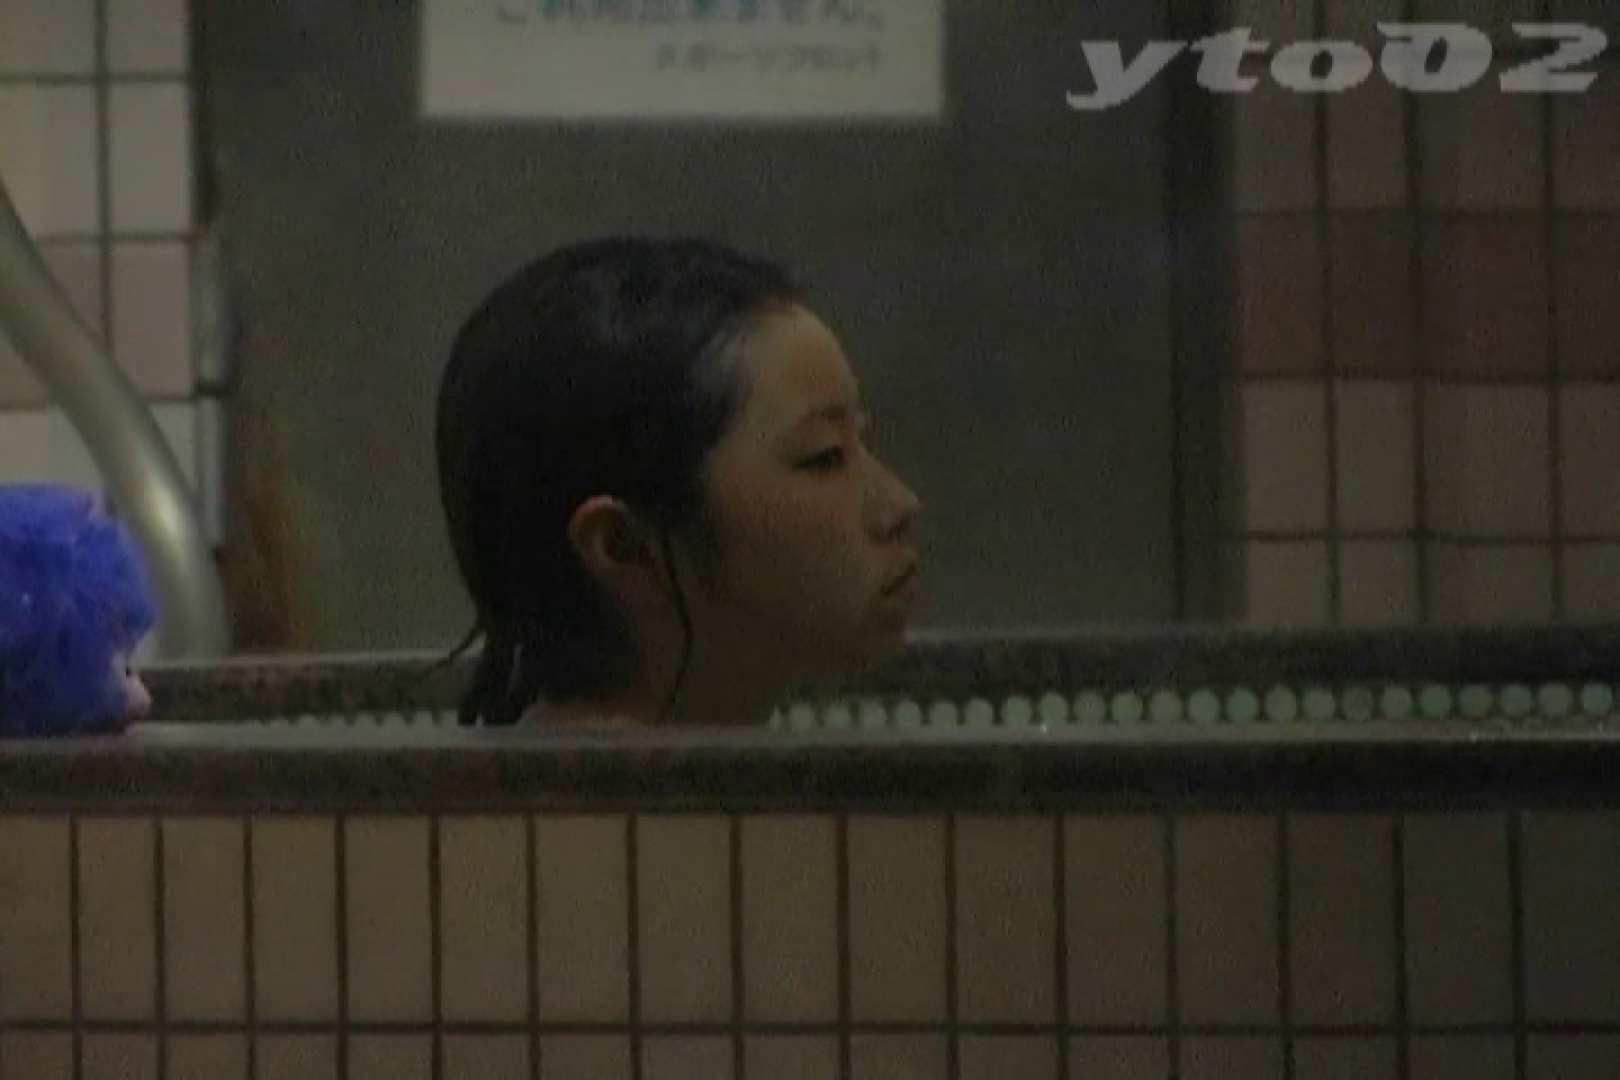 ▲復活限定▲合宿ホテル女風呂盗撮 Vol.14 名作 戯れ無修正画像 95画像 7